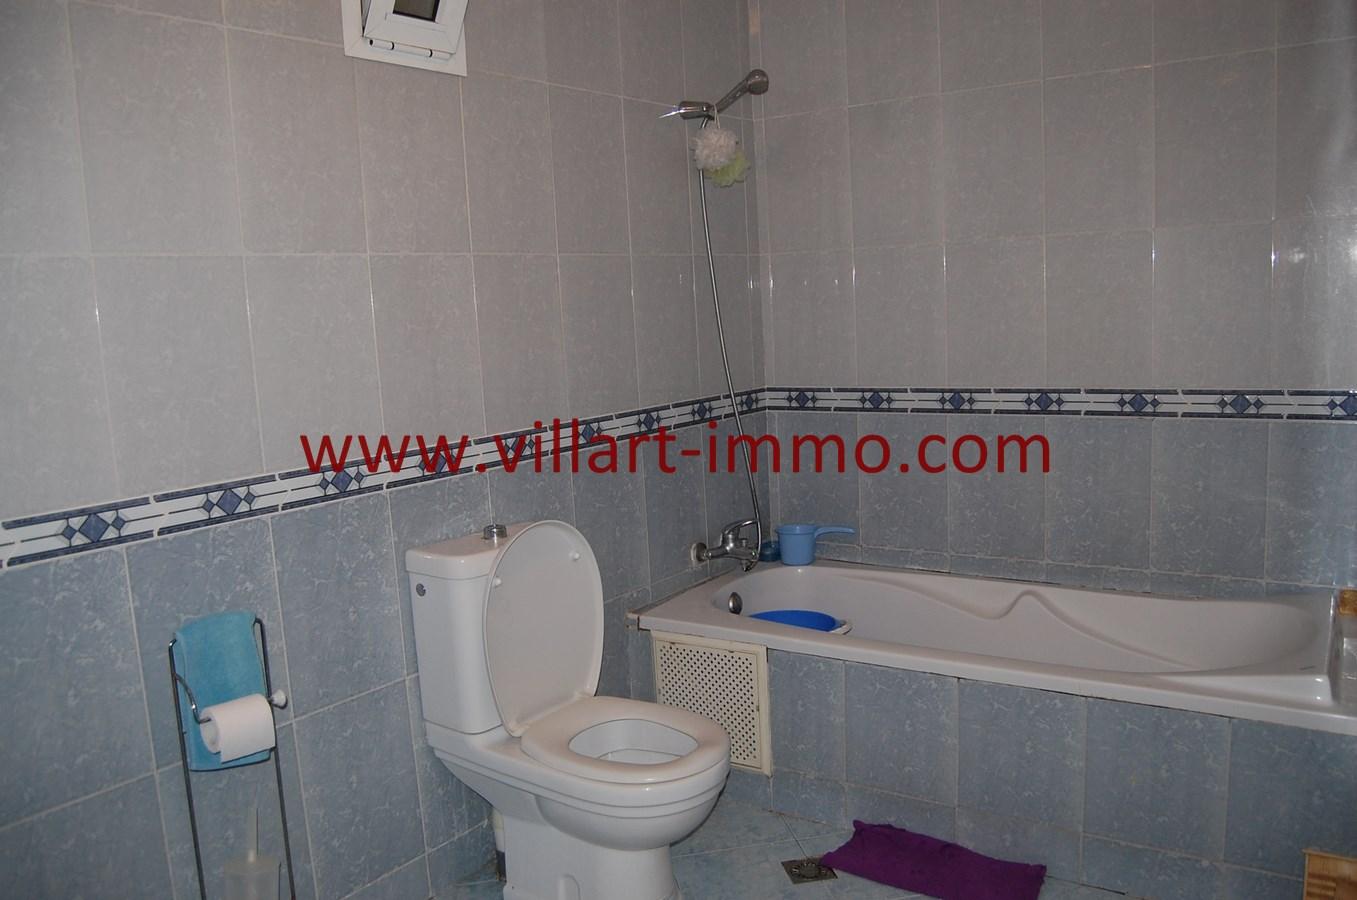 8-Vente-Appartement-Tanger-Centre-Ville-Salle de bain-VA505-Villart Immo